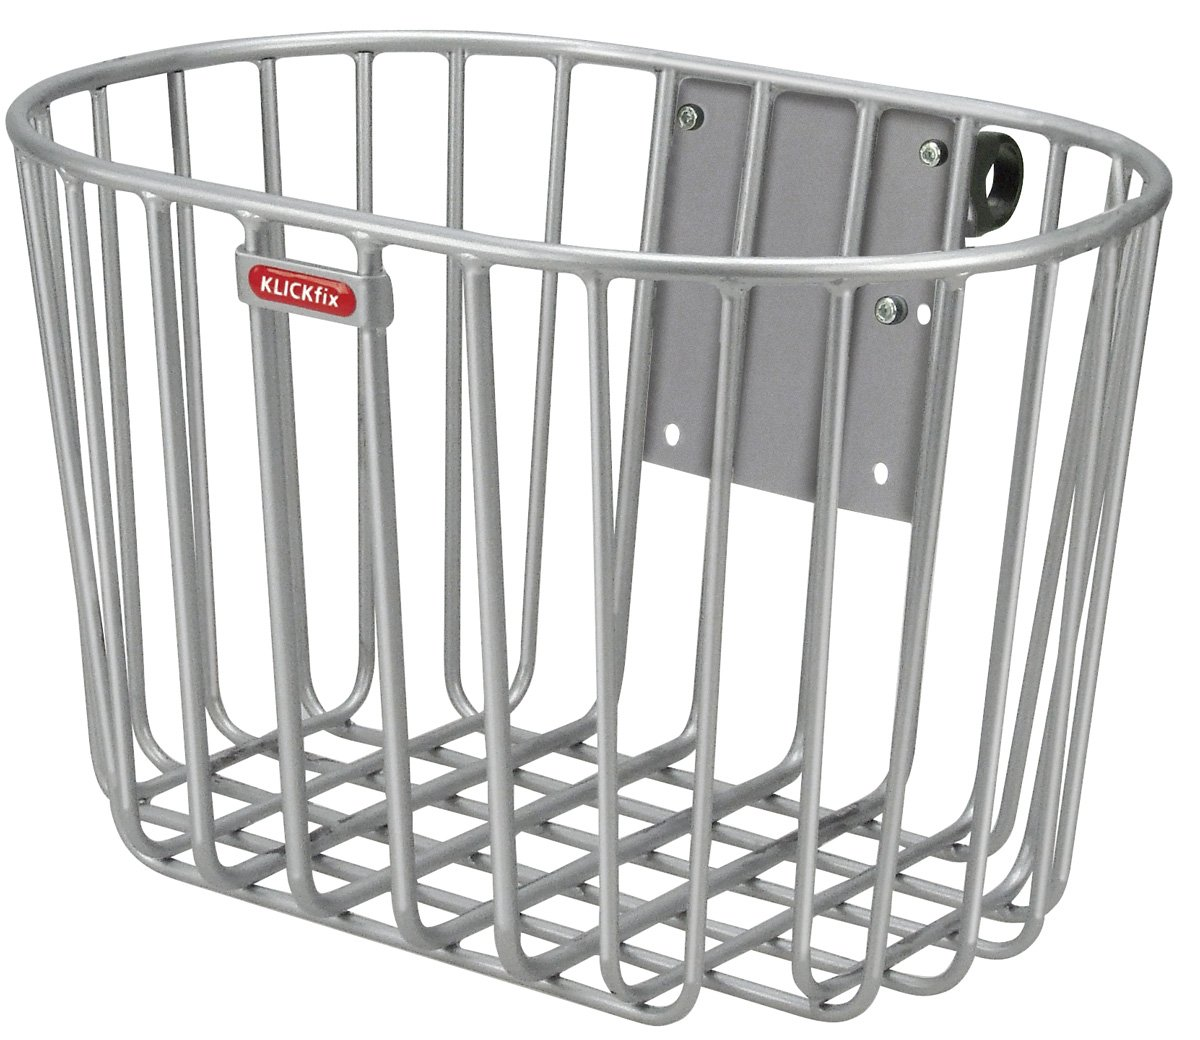 KlickFix Alumino Front Handlebar Basket grey